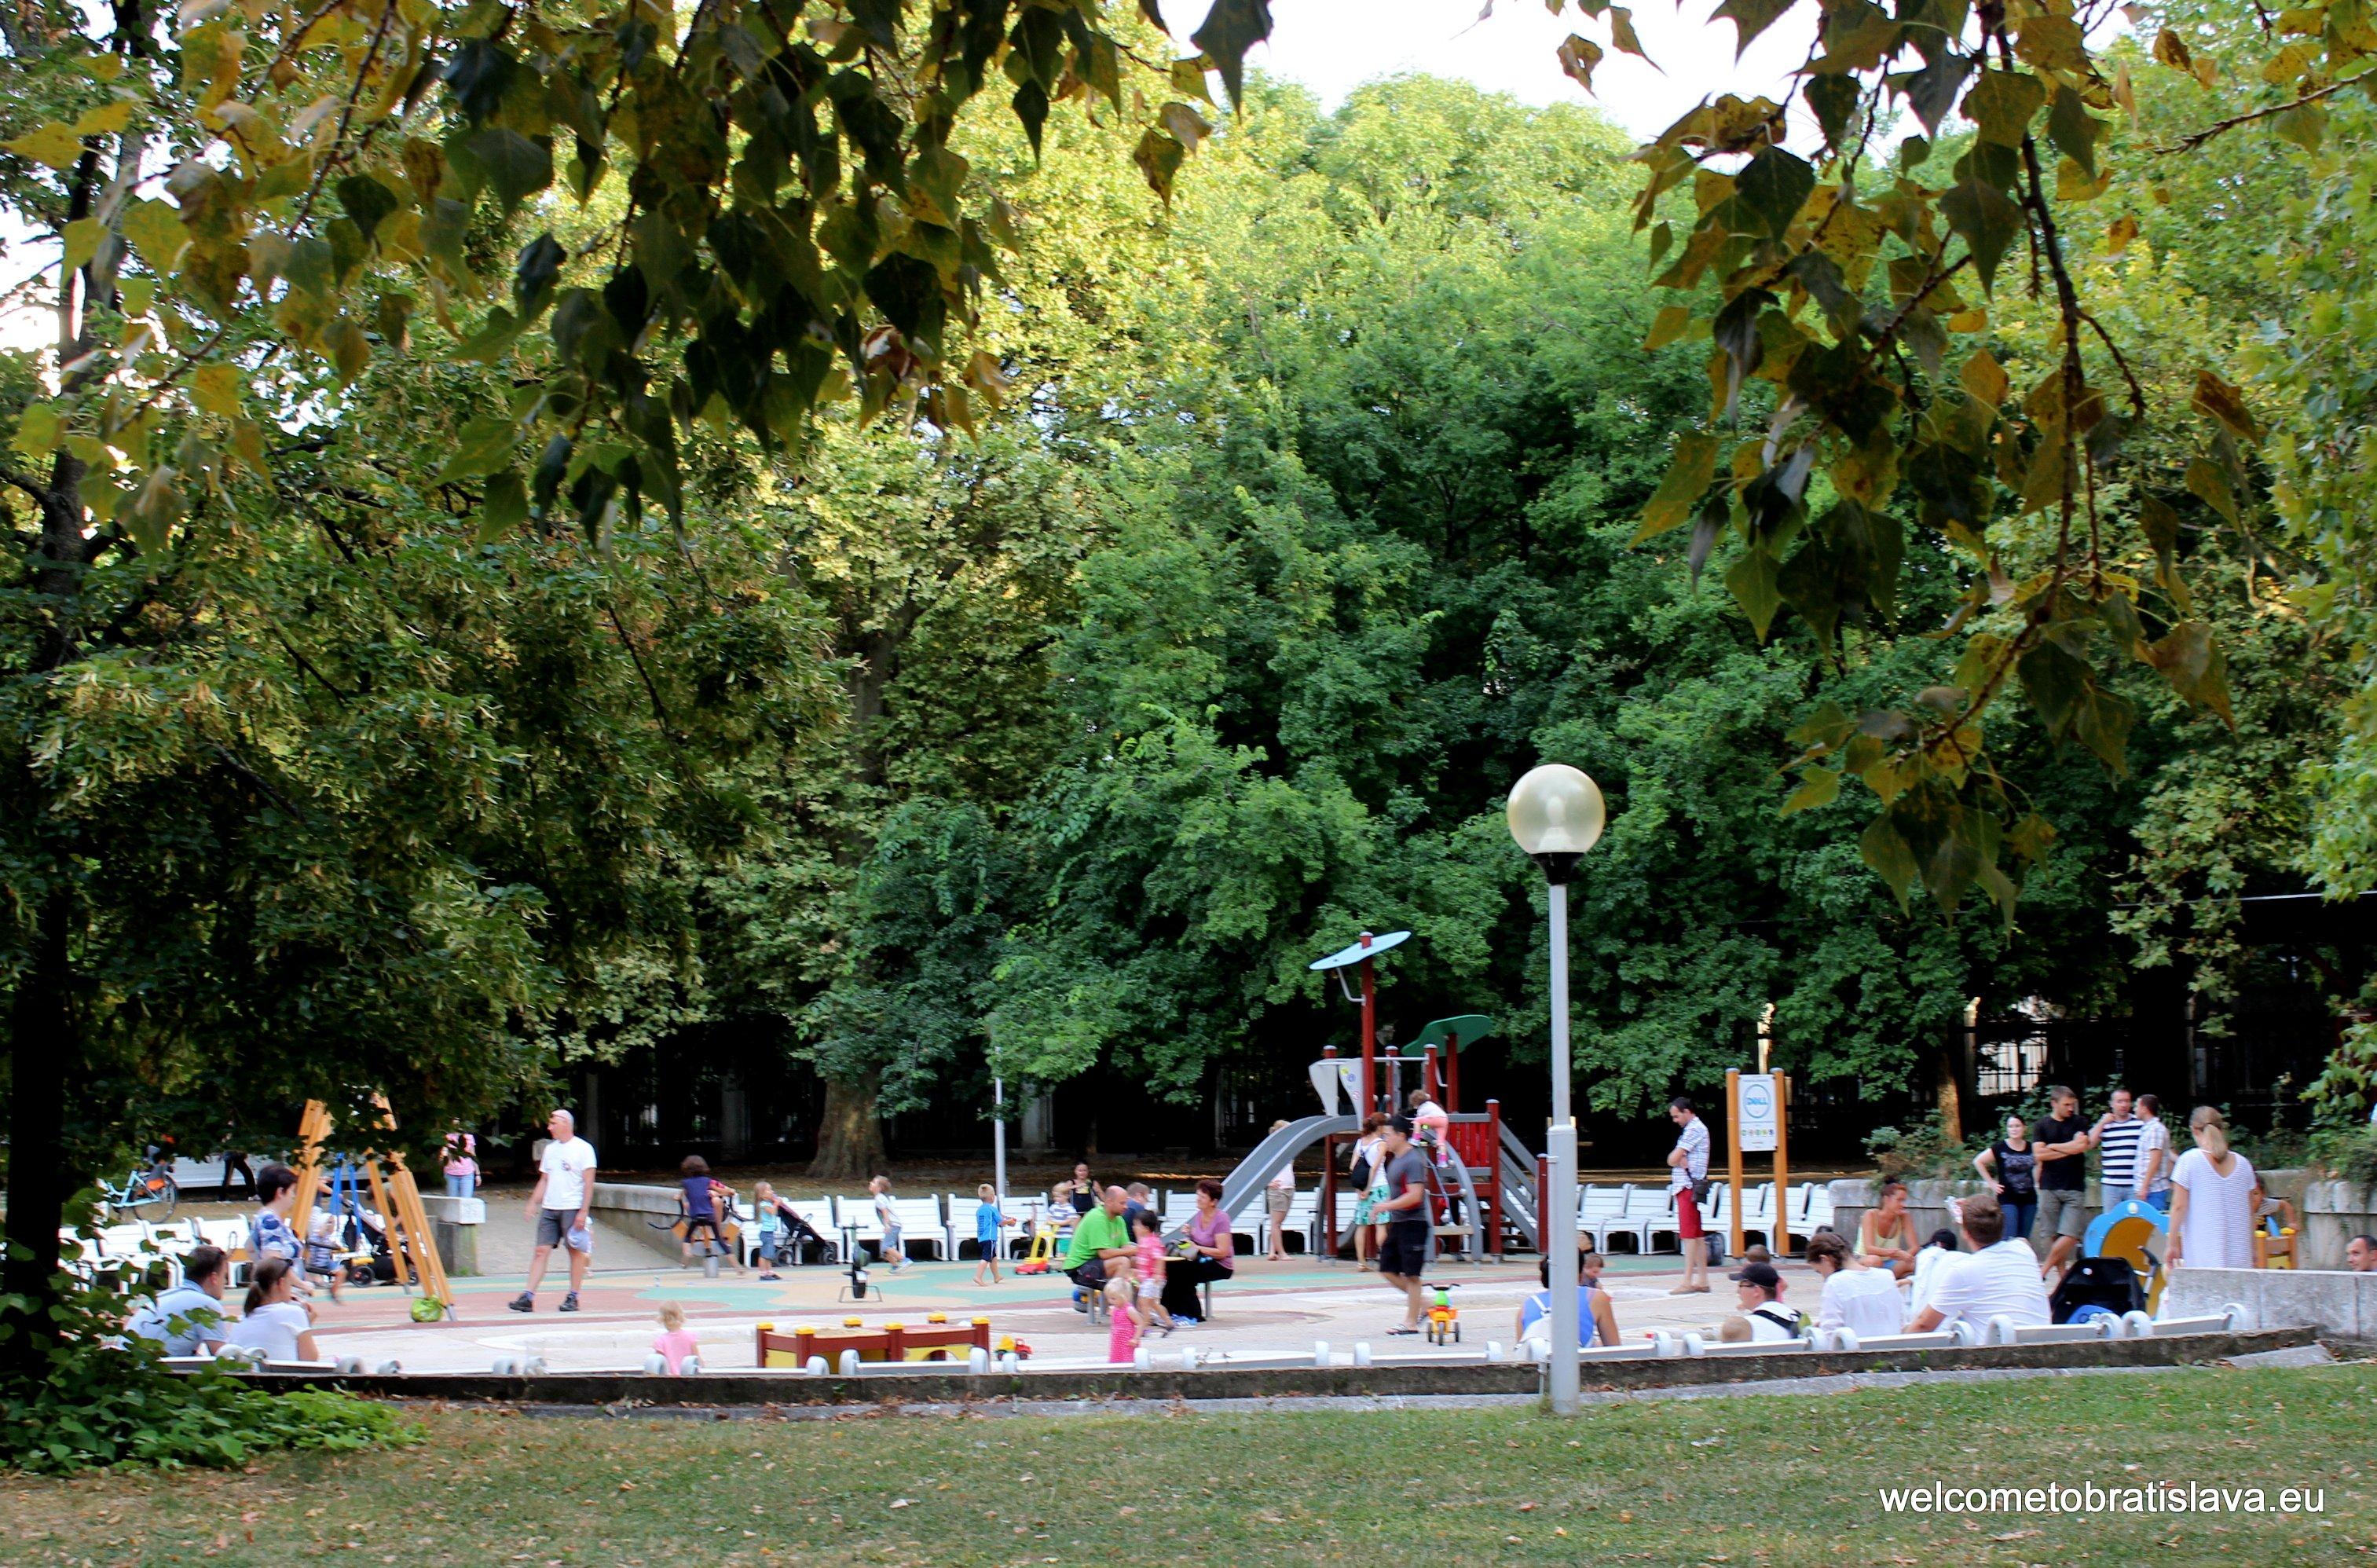 Outdoor places for kids in Bratislava - Medicka zahrada